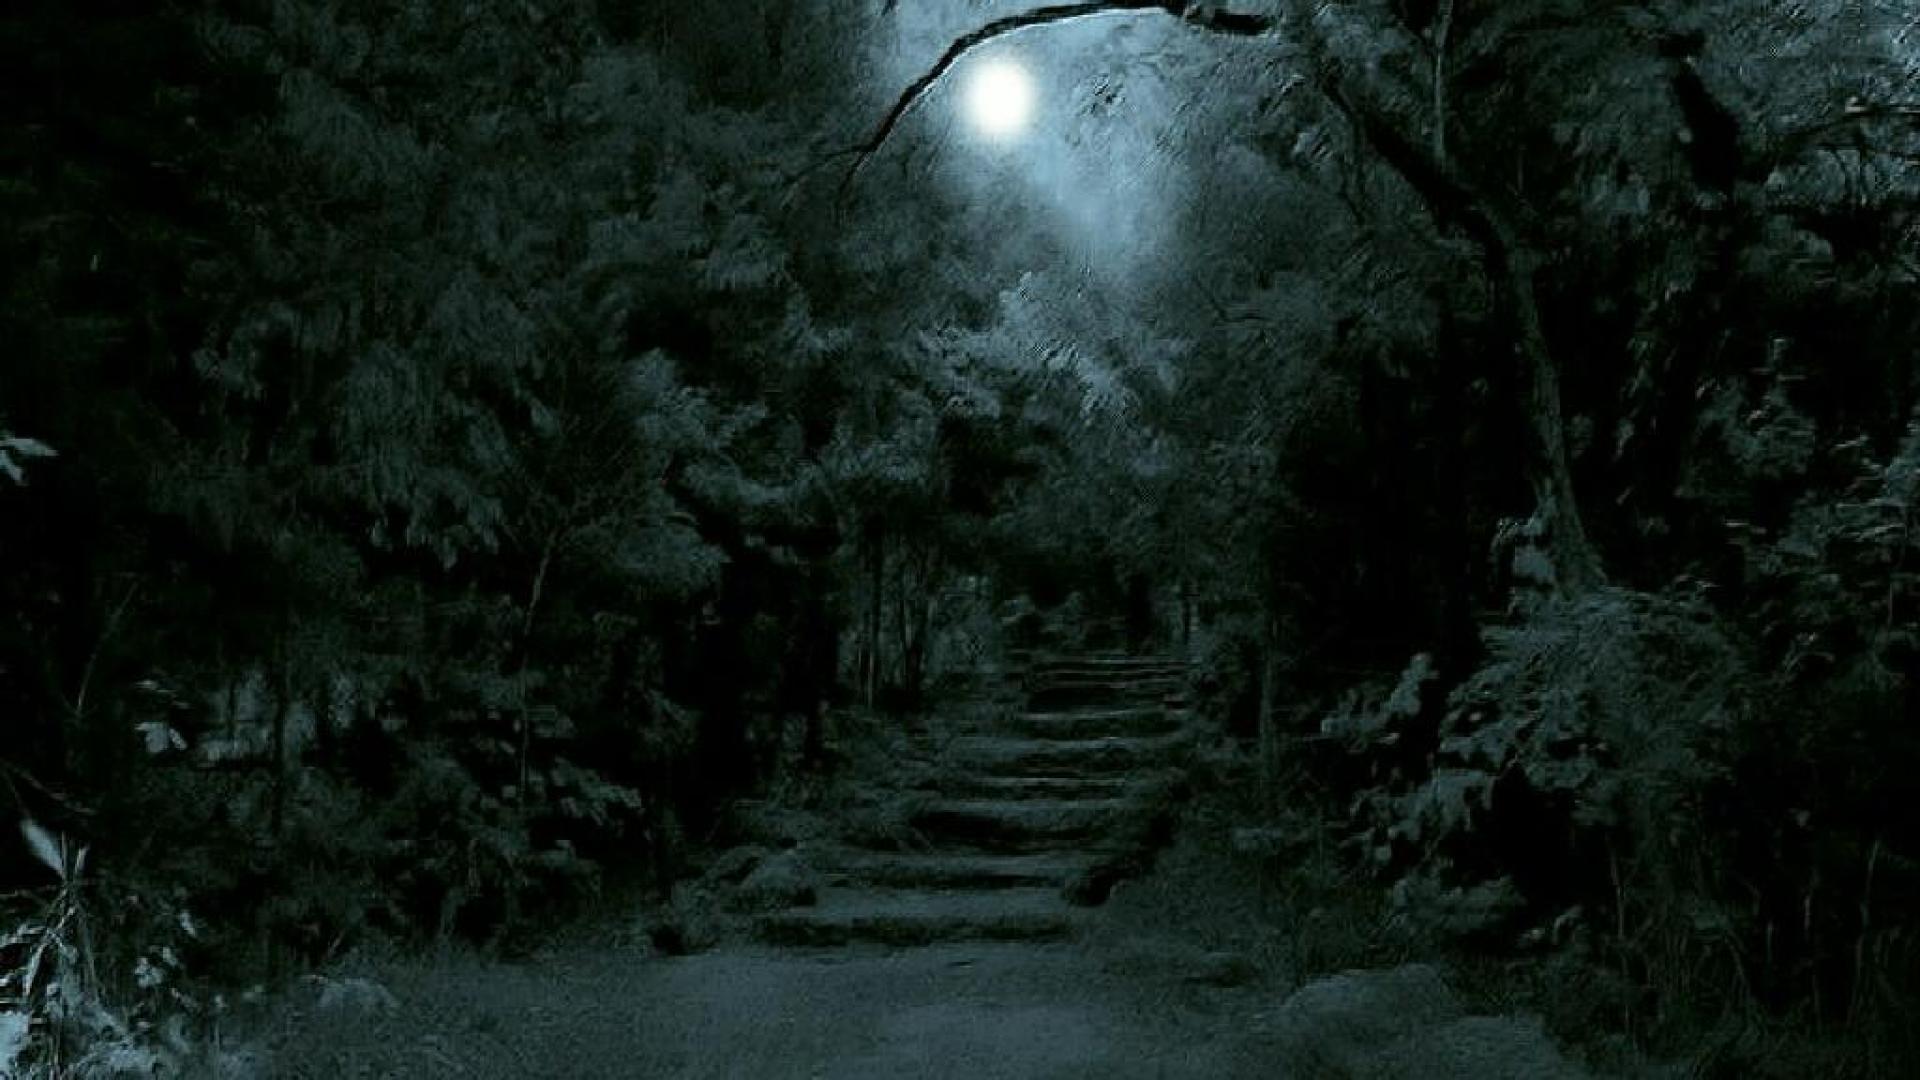 Dark Forest Wallpapers Wallpapersink High Resolution Dark